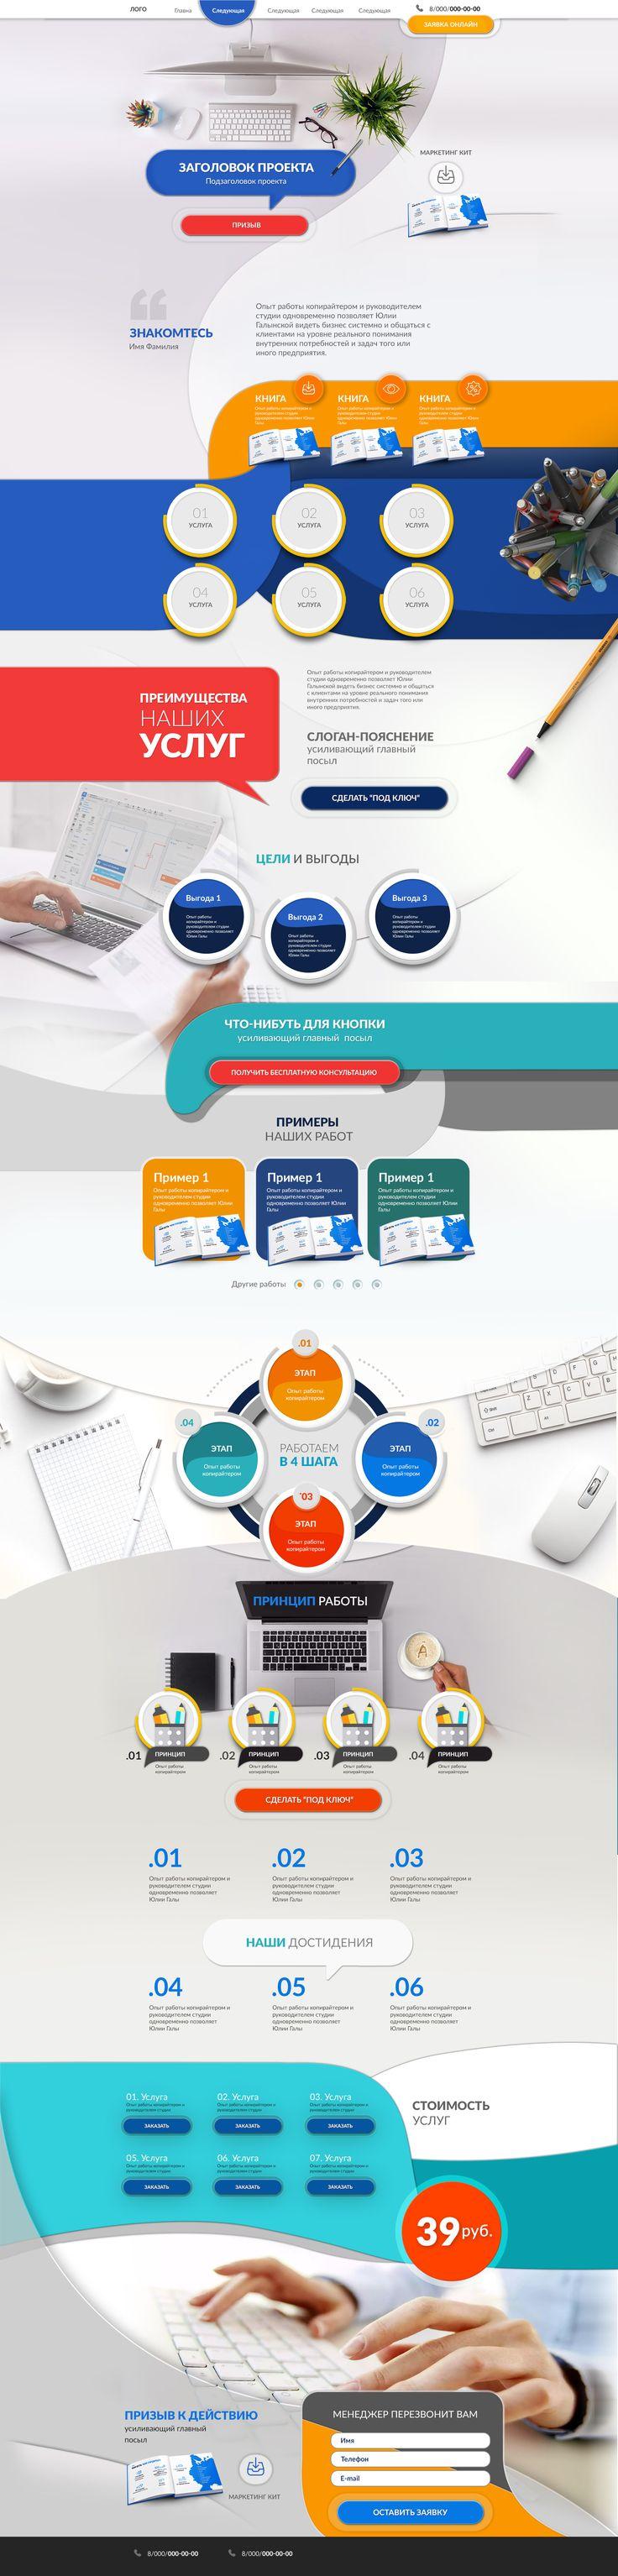 CREATIVE STUDIO  #landing, #page, #design, #web, #HTML5, #photoshop, #website, #copywrite, #template, #UI/UX